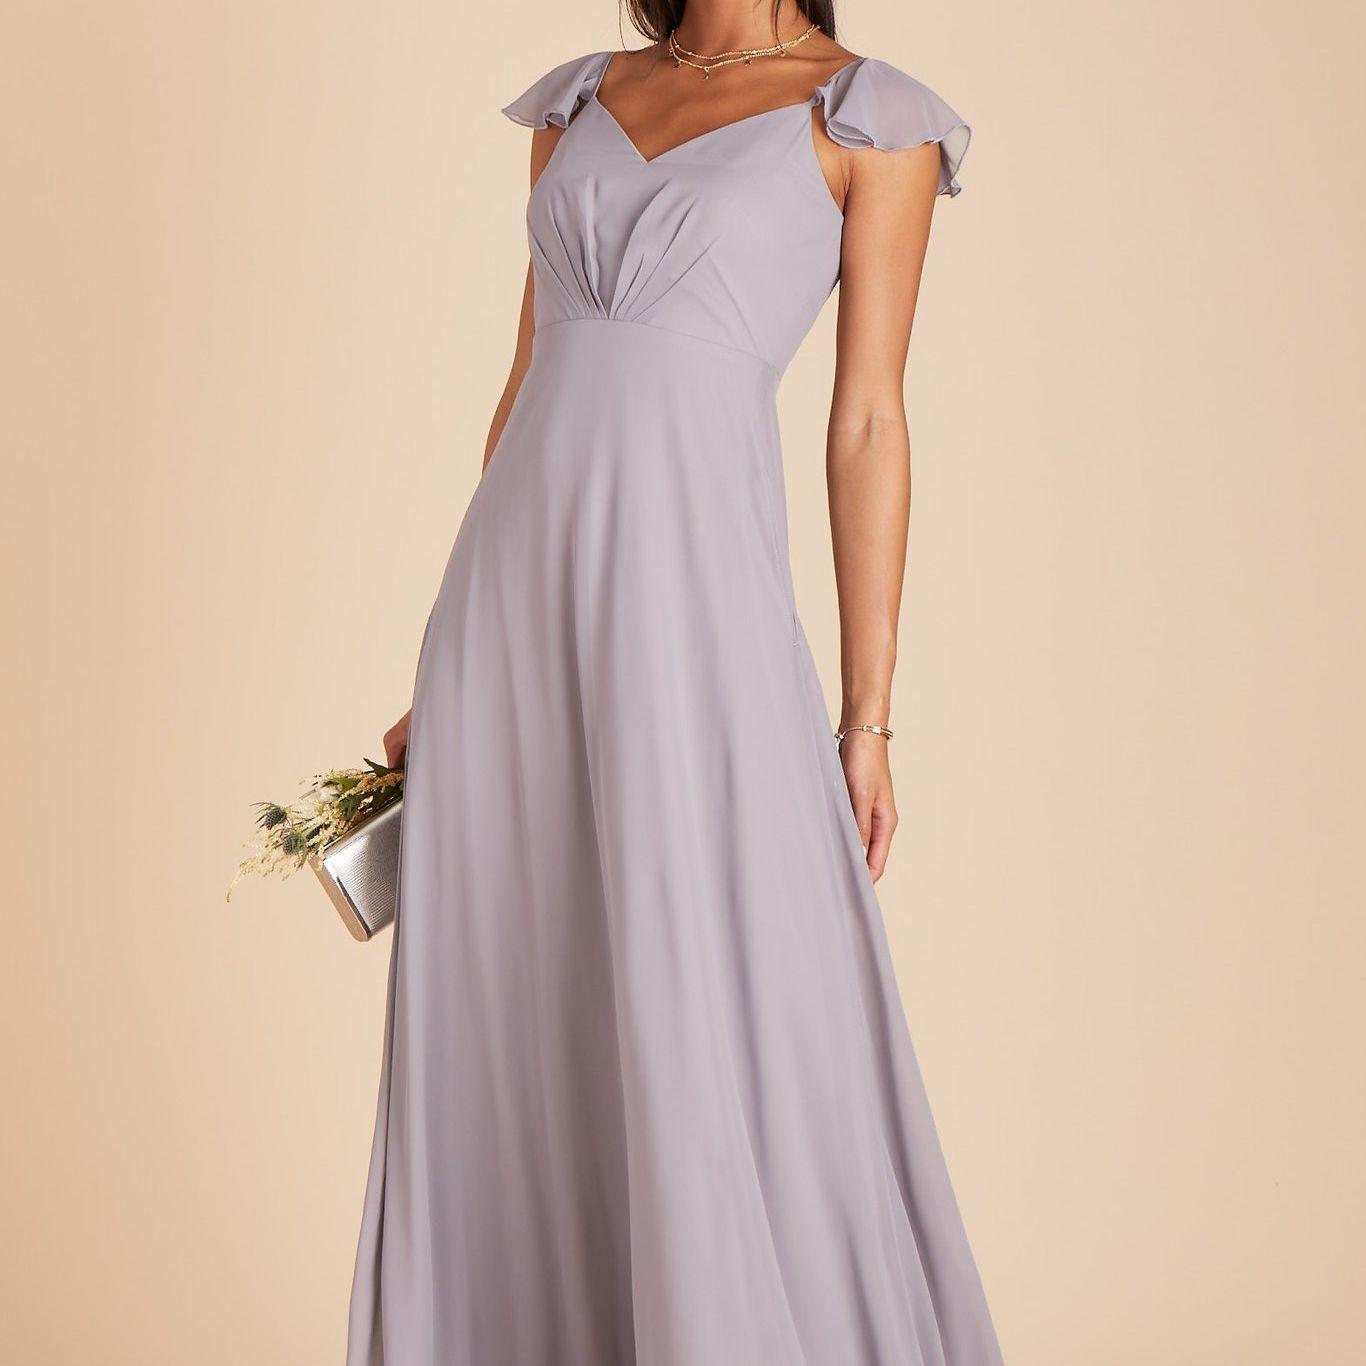 Birdy Grey Kae Dress $99